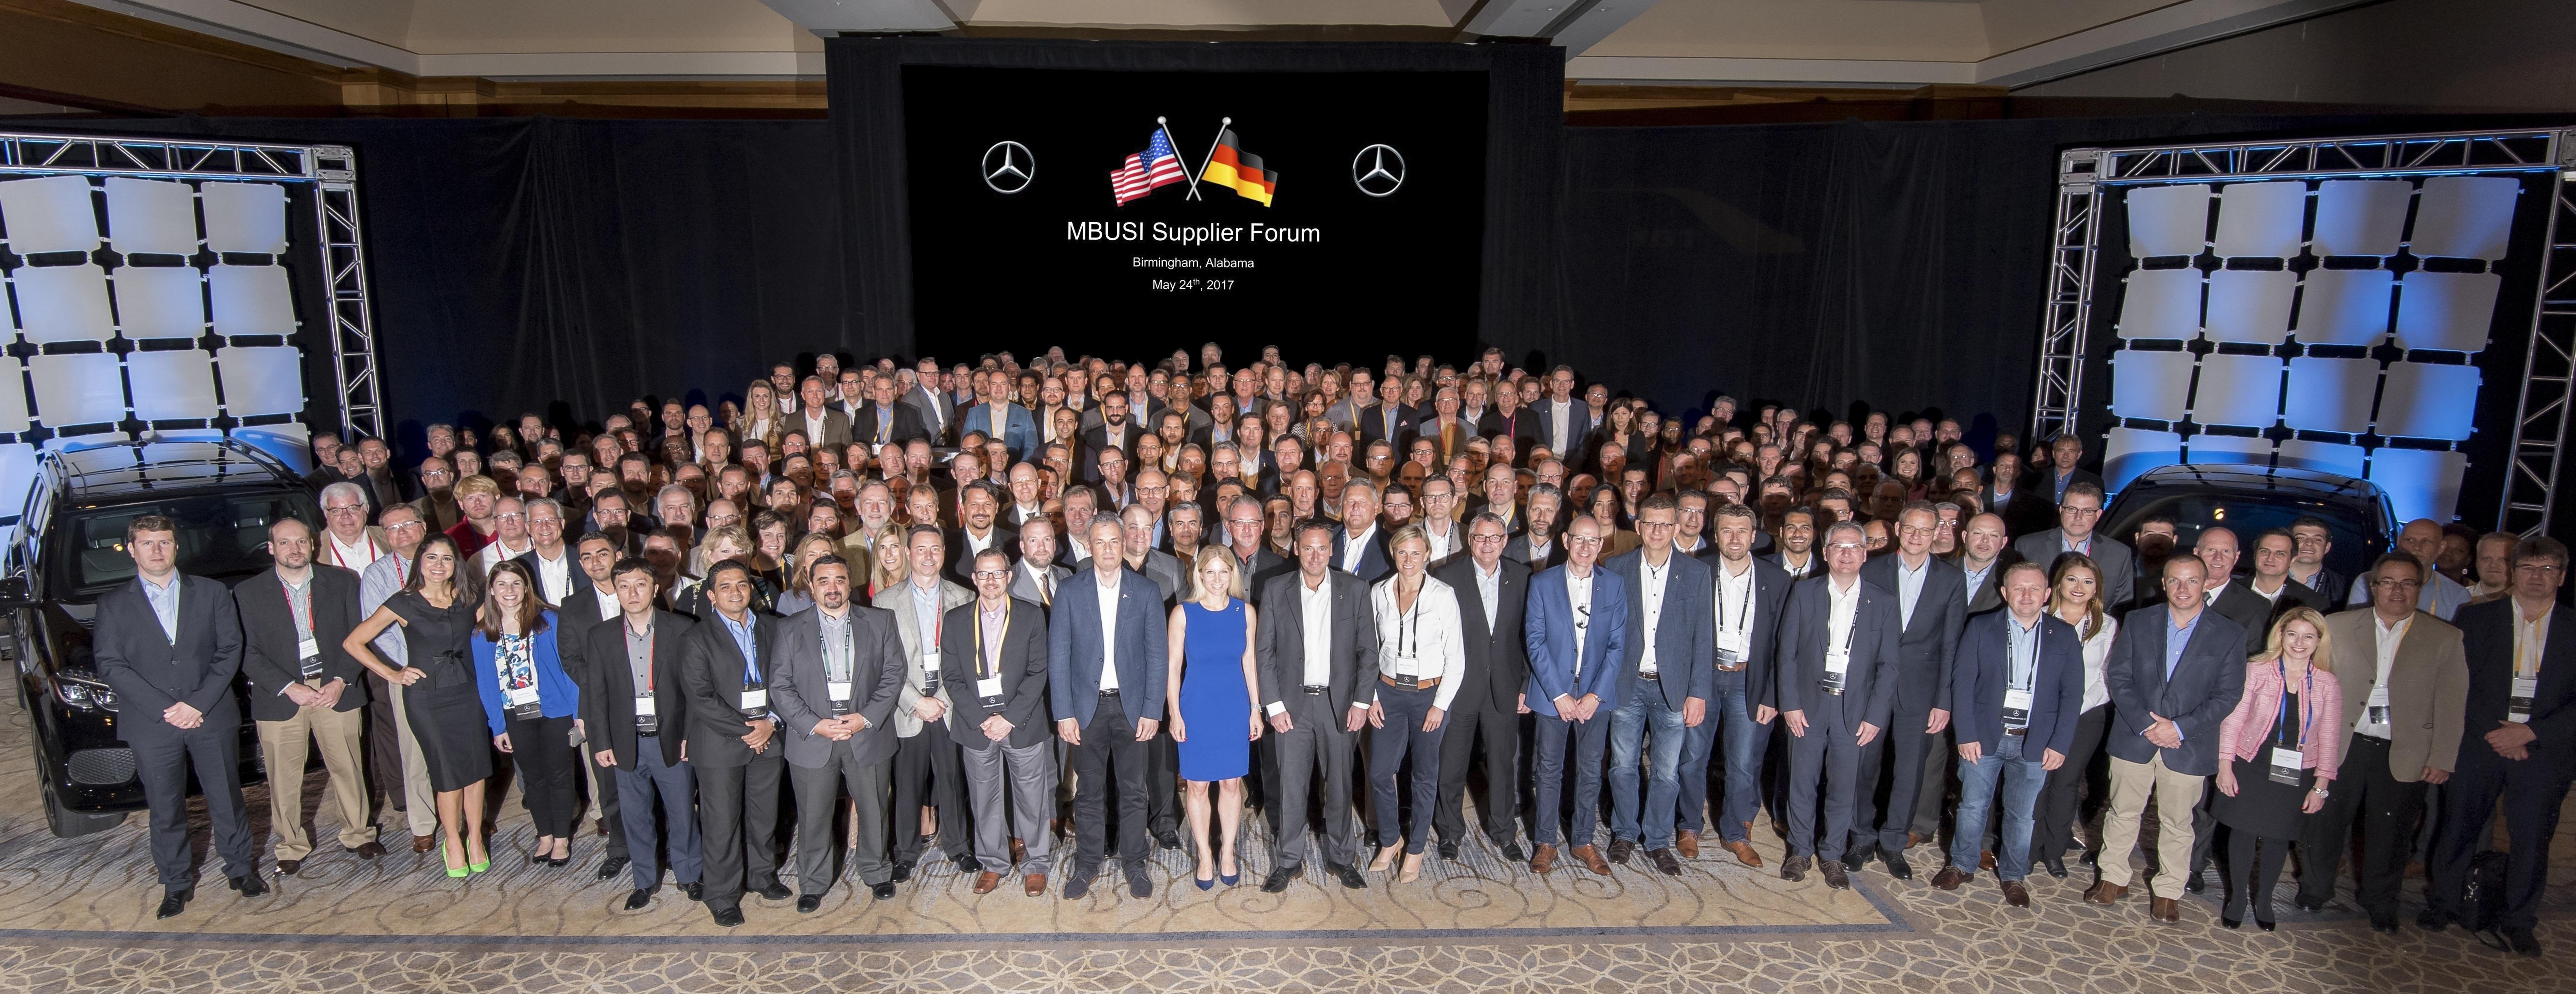 Mercedes Benz U S International Inc Supplier Forum 2017 Paving Future Way Of The Network Usa